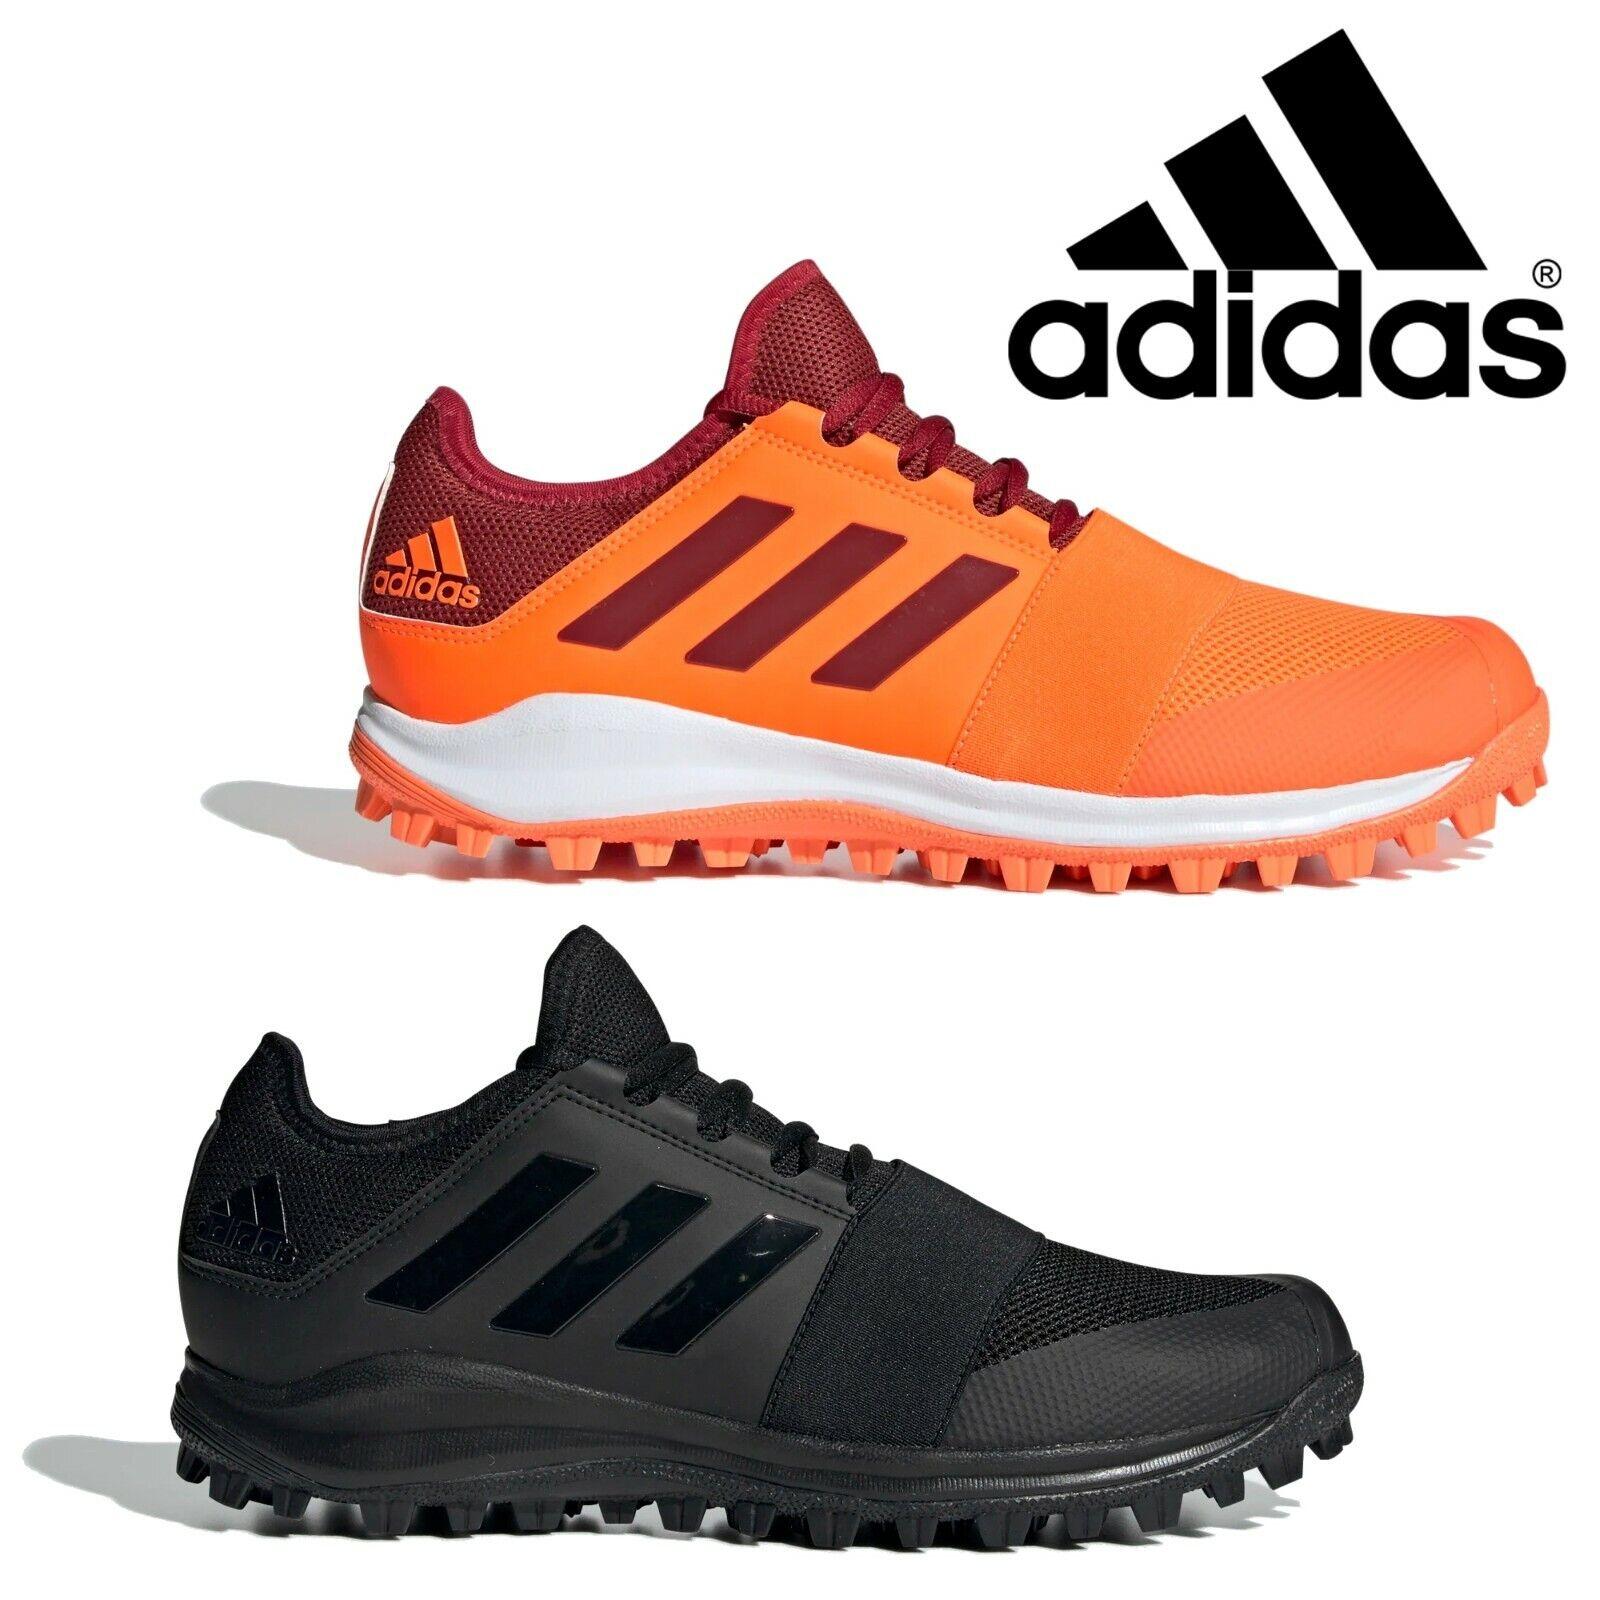 Adidas Divox Men's Field Hockey Shoes